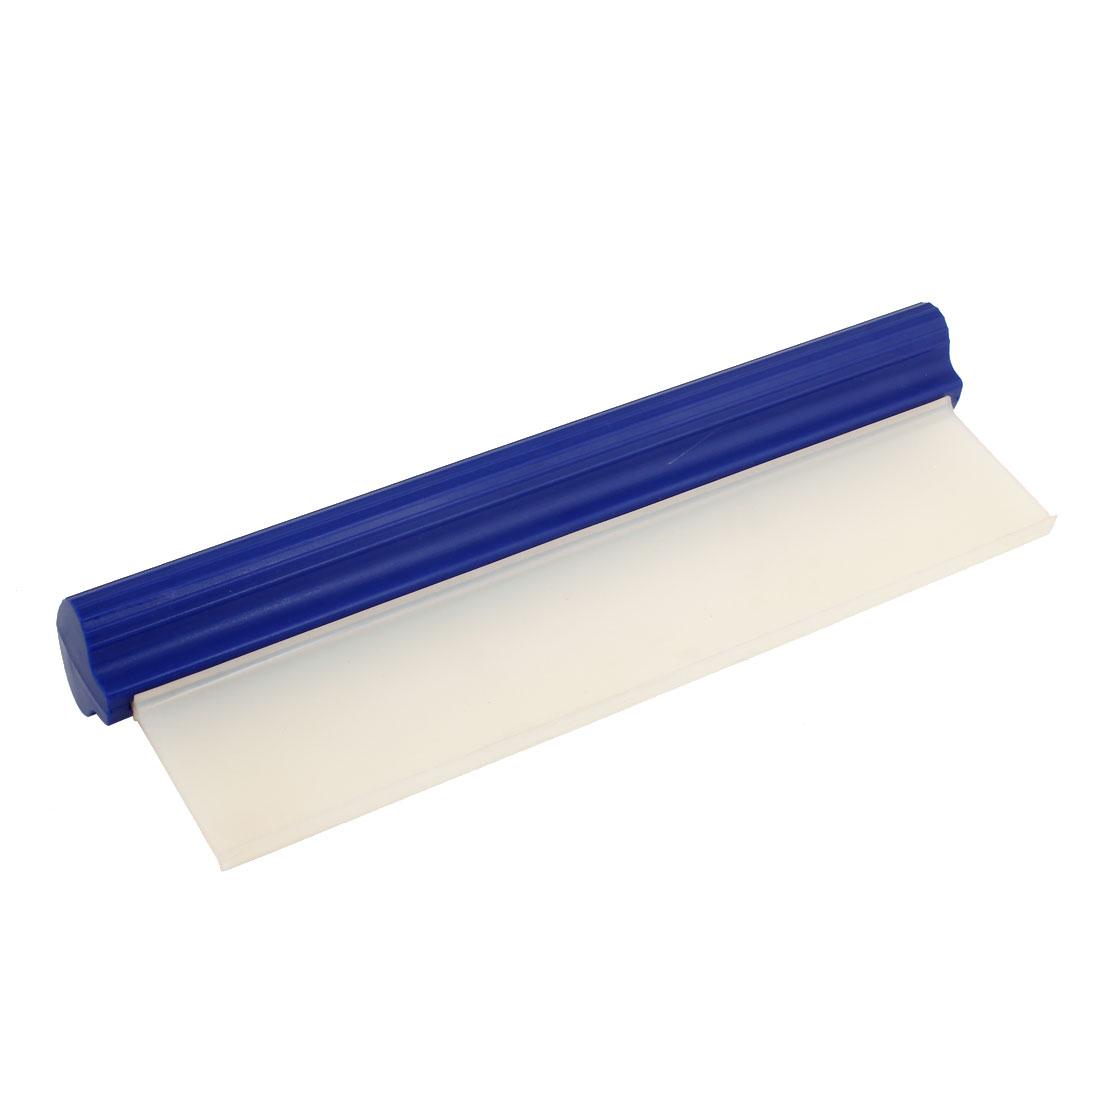 Blue Handle Clear Blade Car Windshield Window Bubble Scraper Cleaner Tool